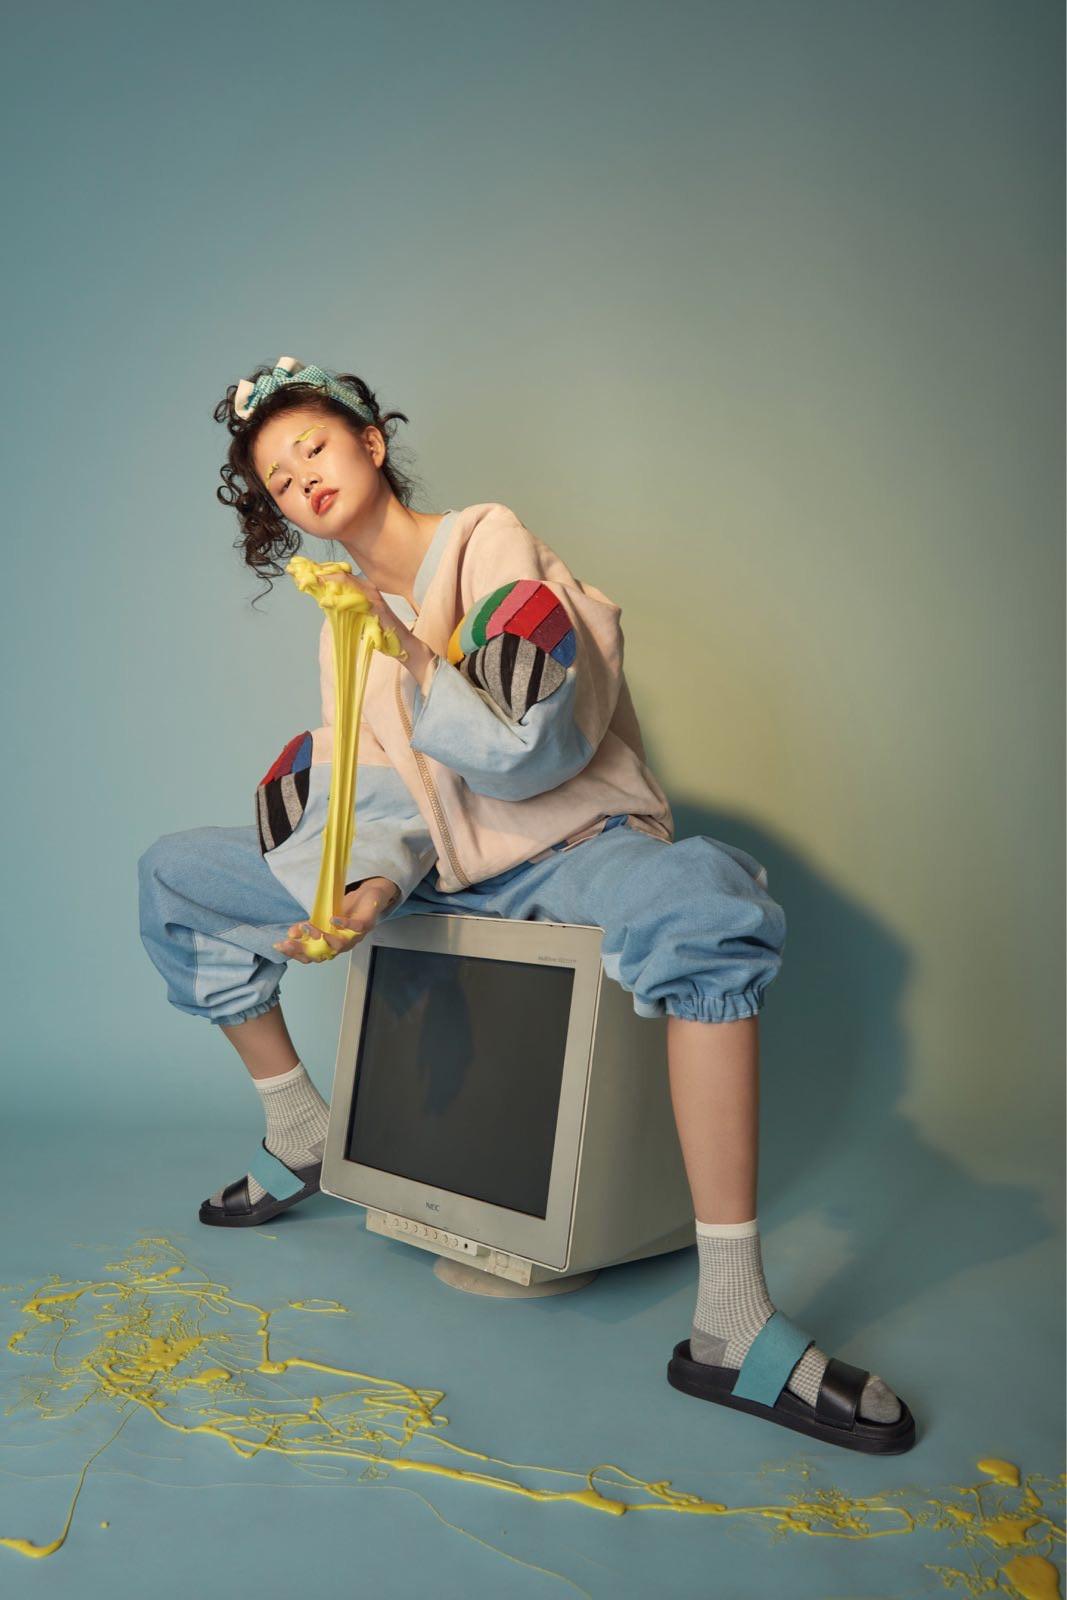 Signal Lost by Yang Lu